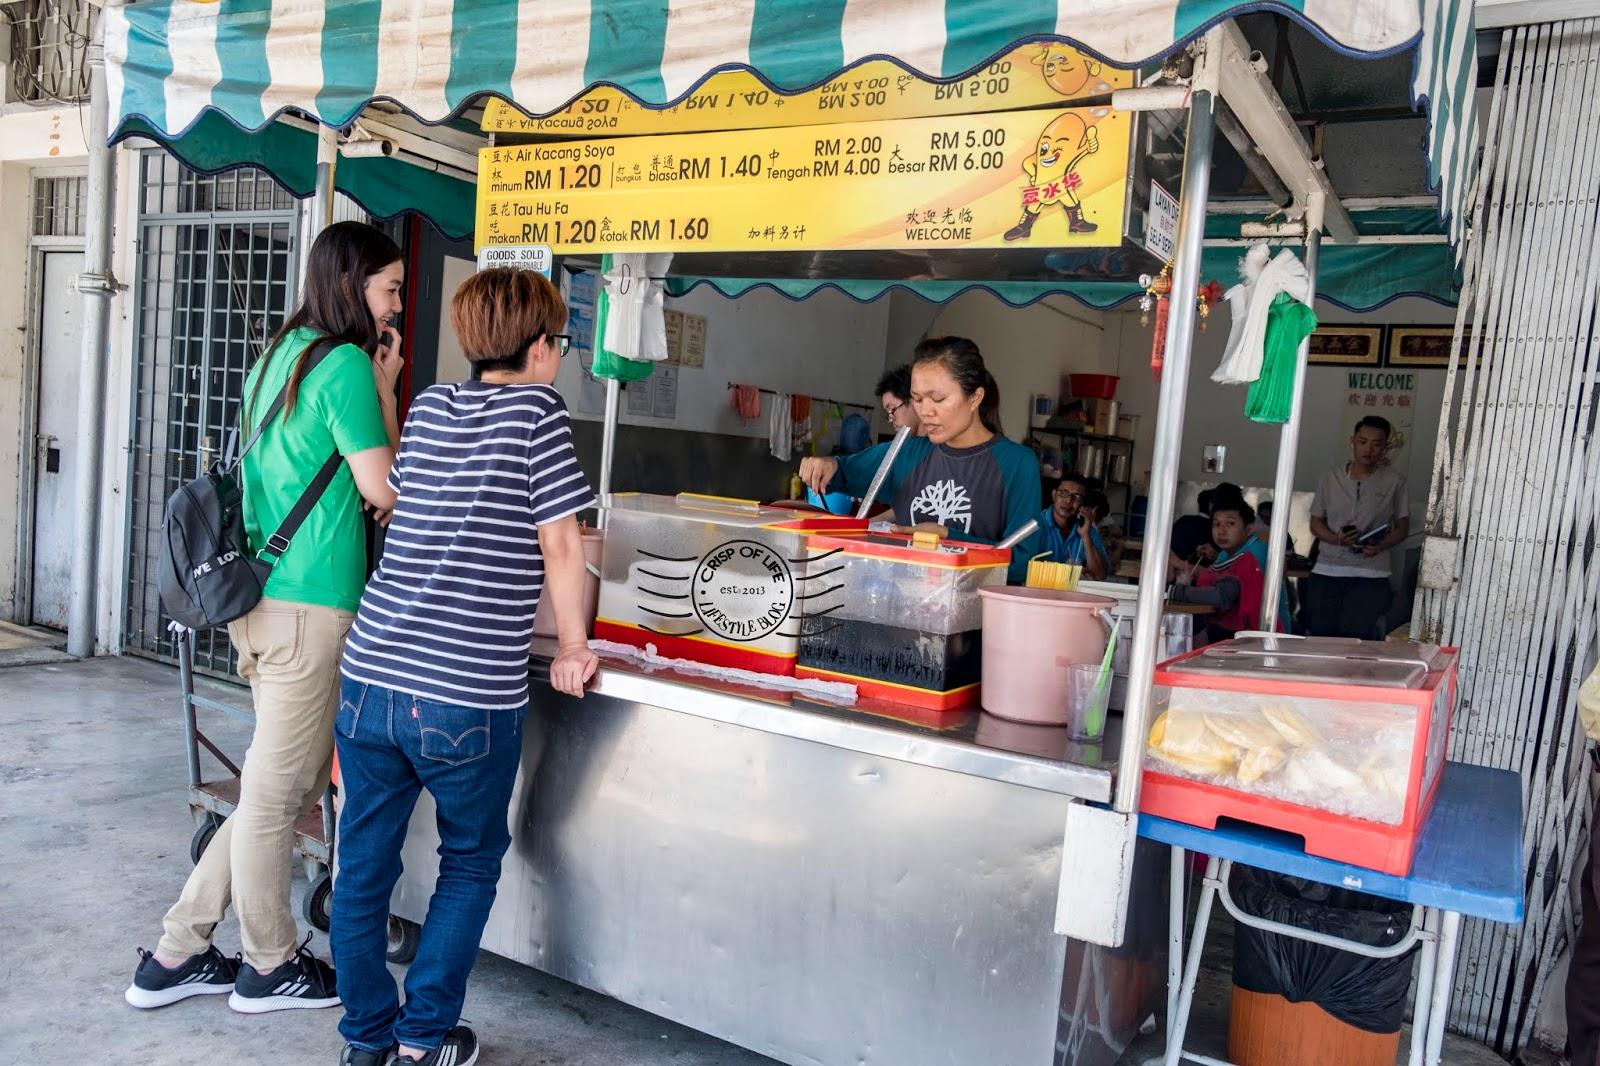 Kampung Benggali Bean Milk Trading, Butterworth Soya Bean Milk Tau Fu Fa